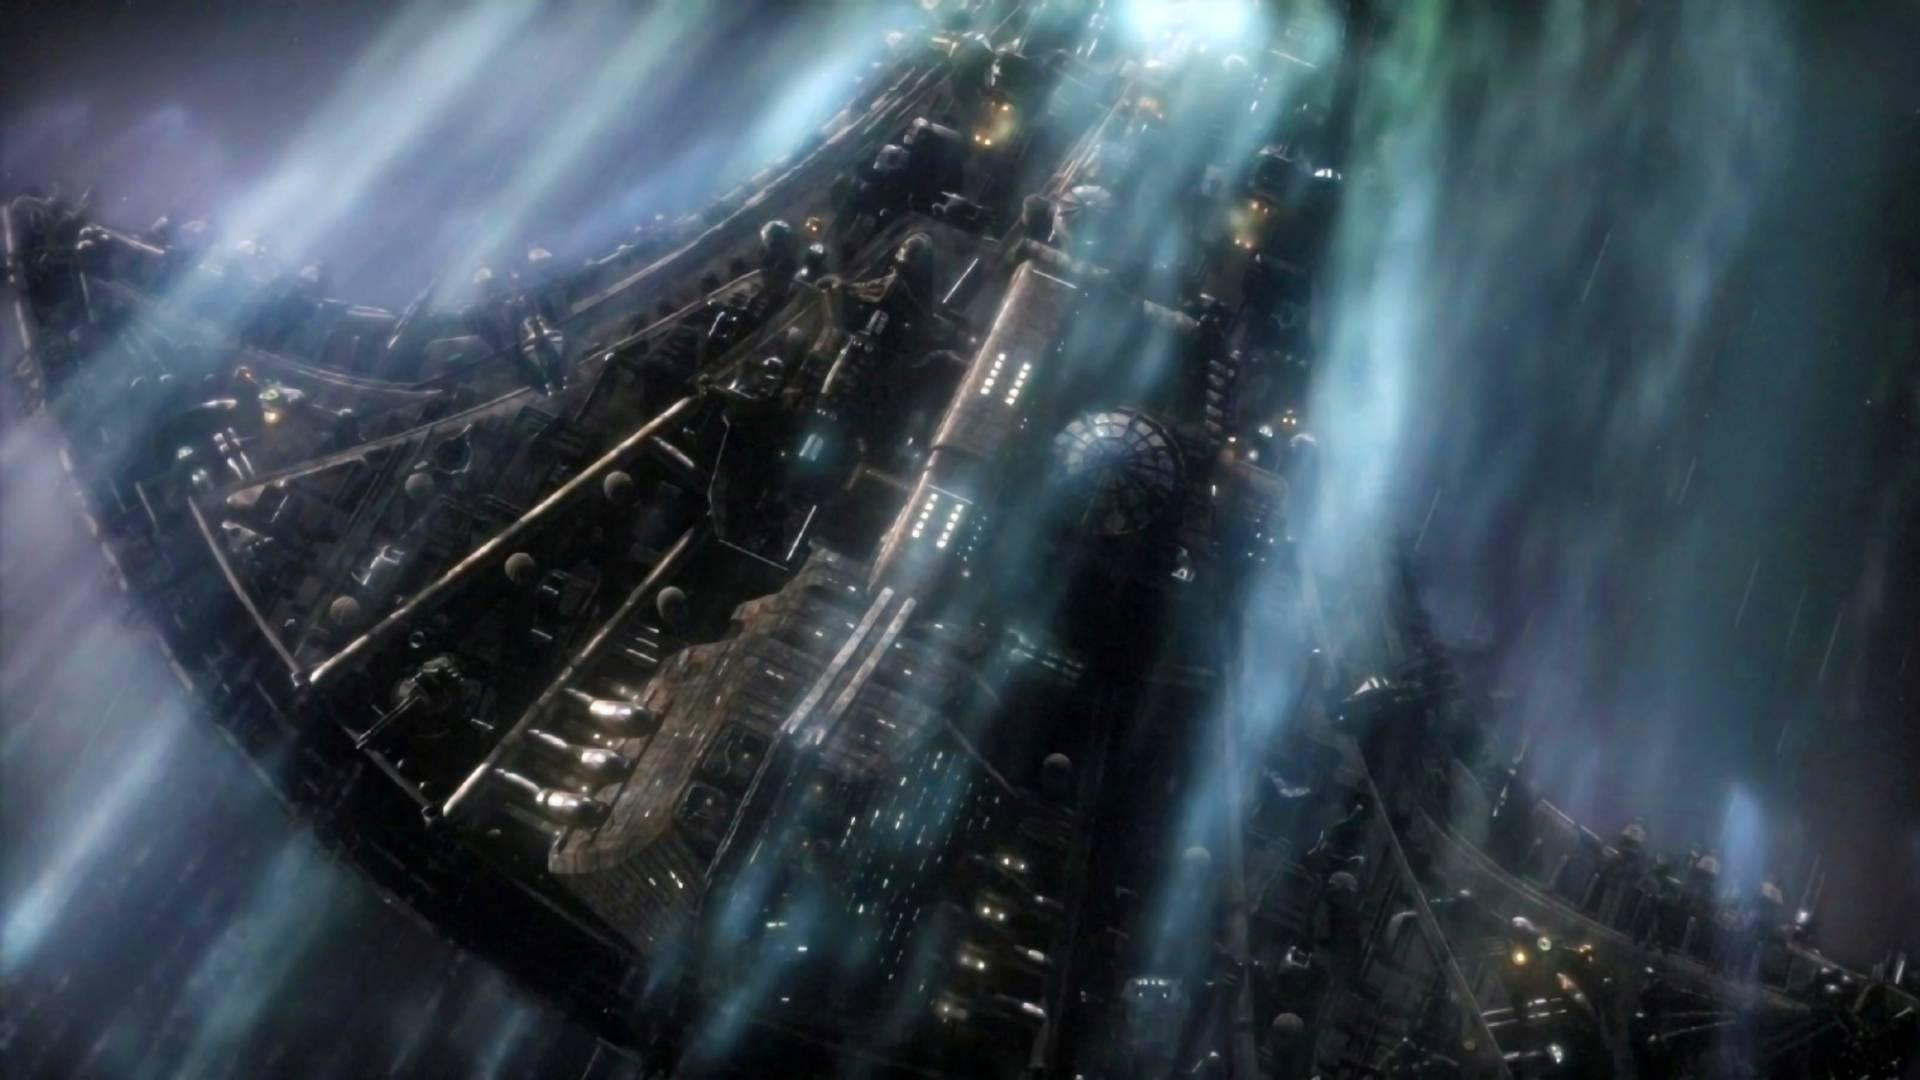 stargate wallpaper universe space - photo #17